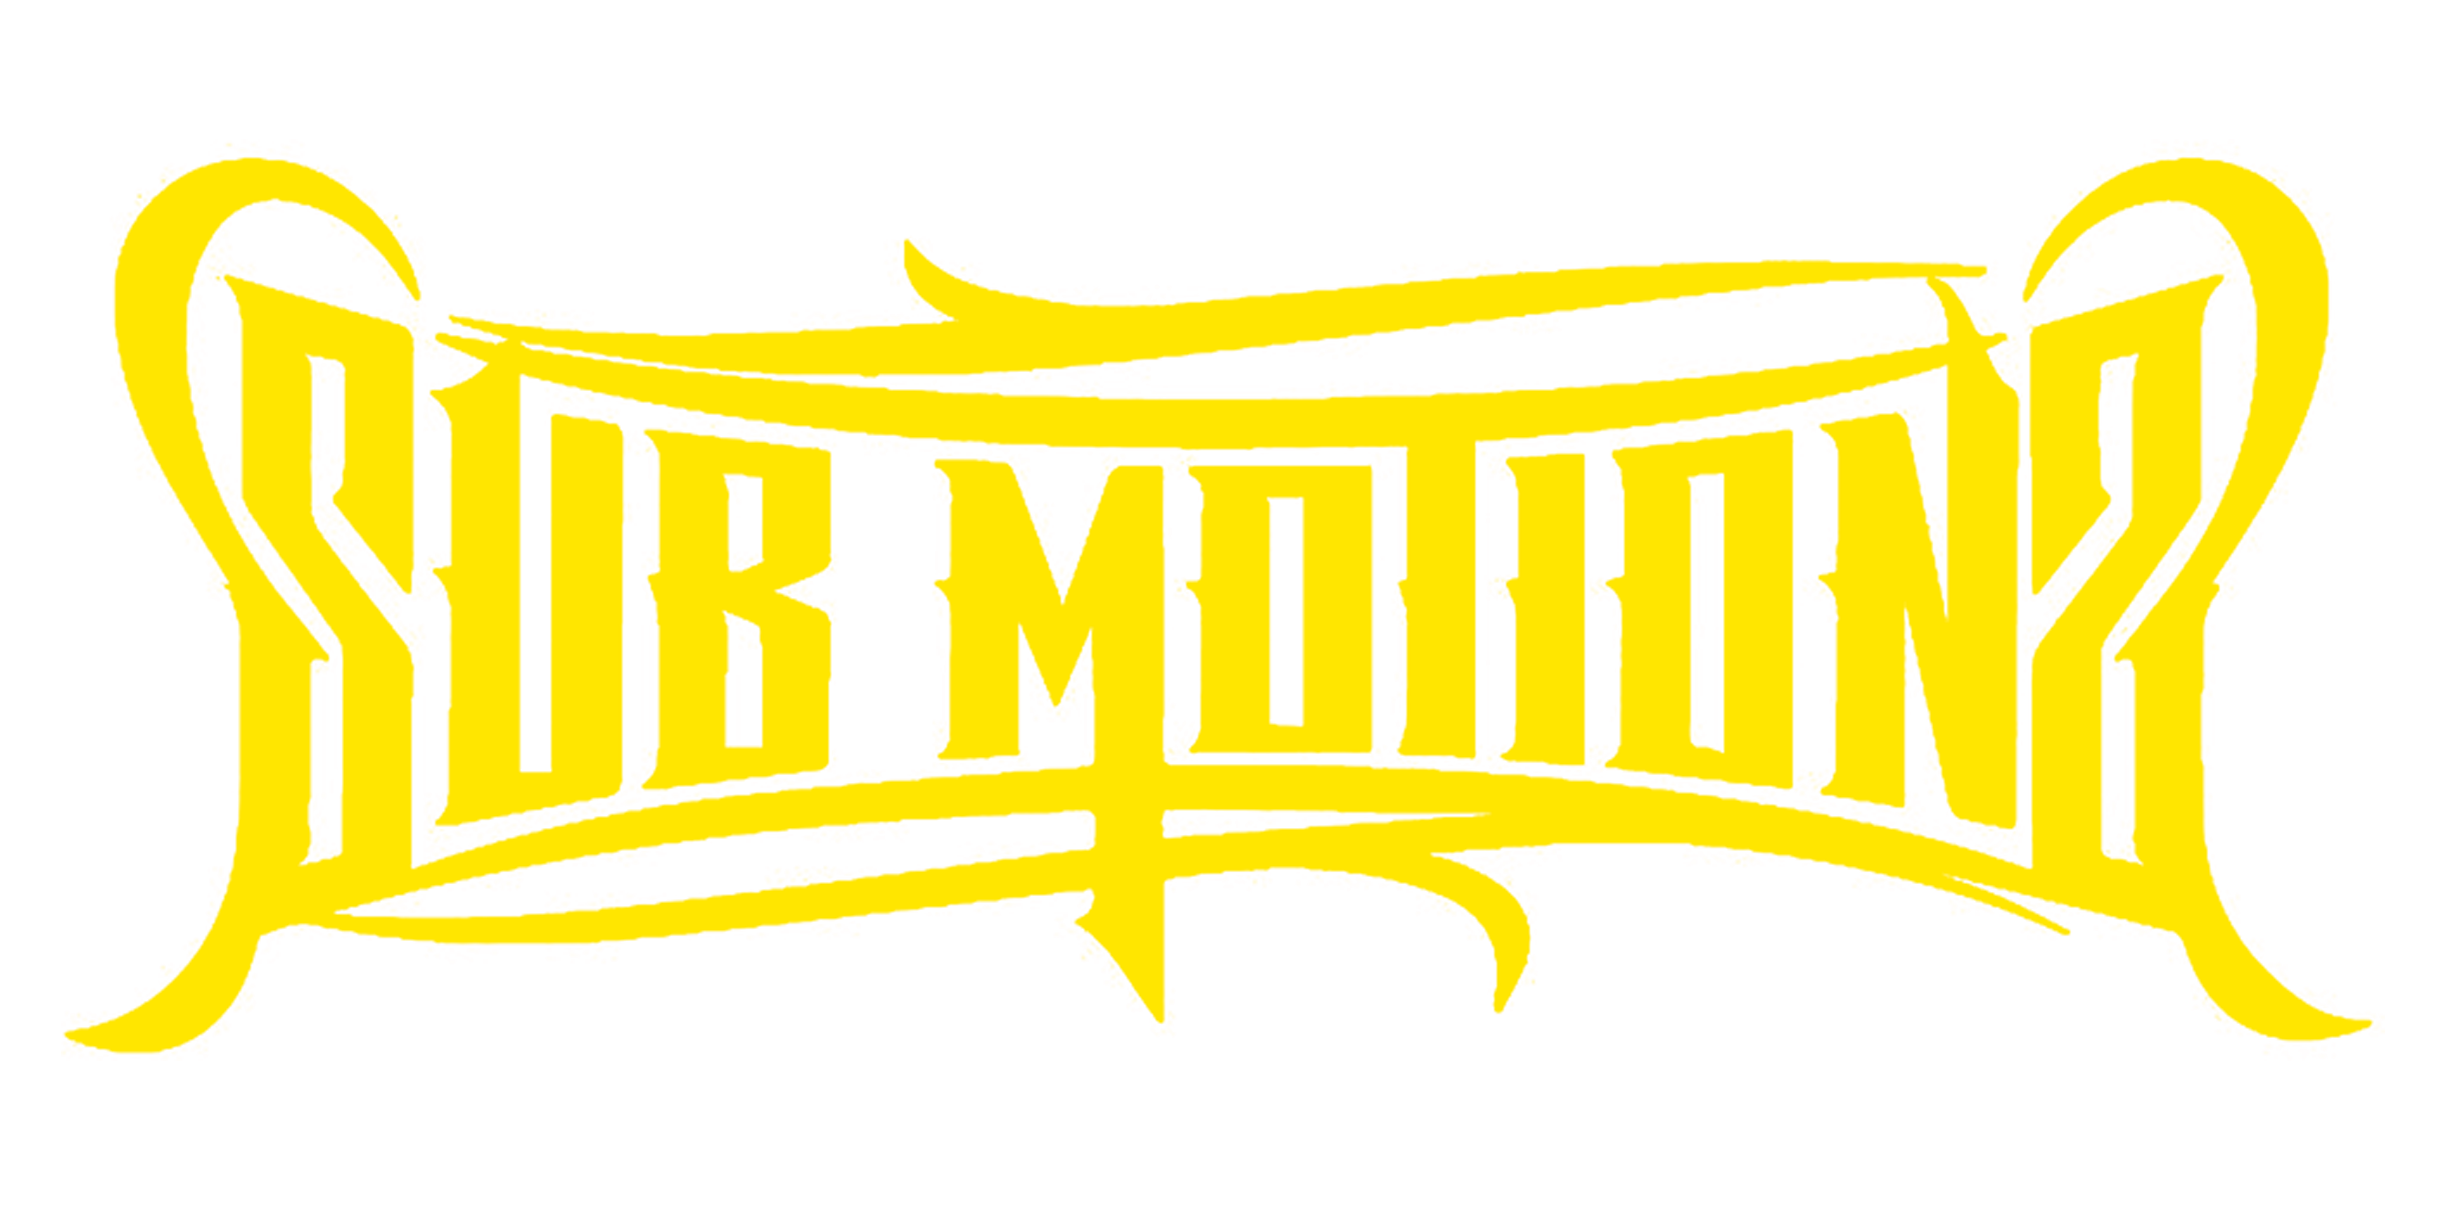 Submotionz